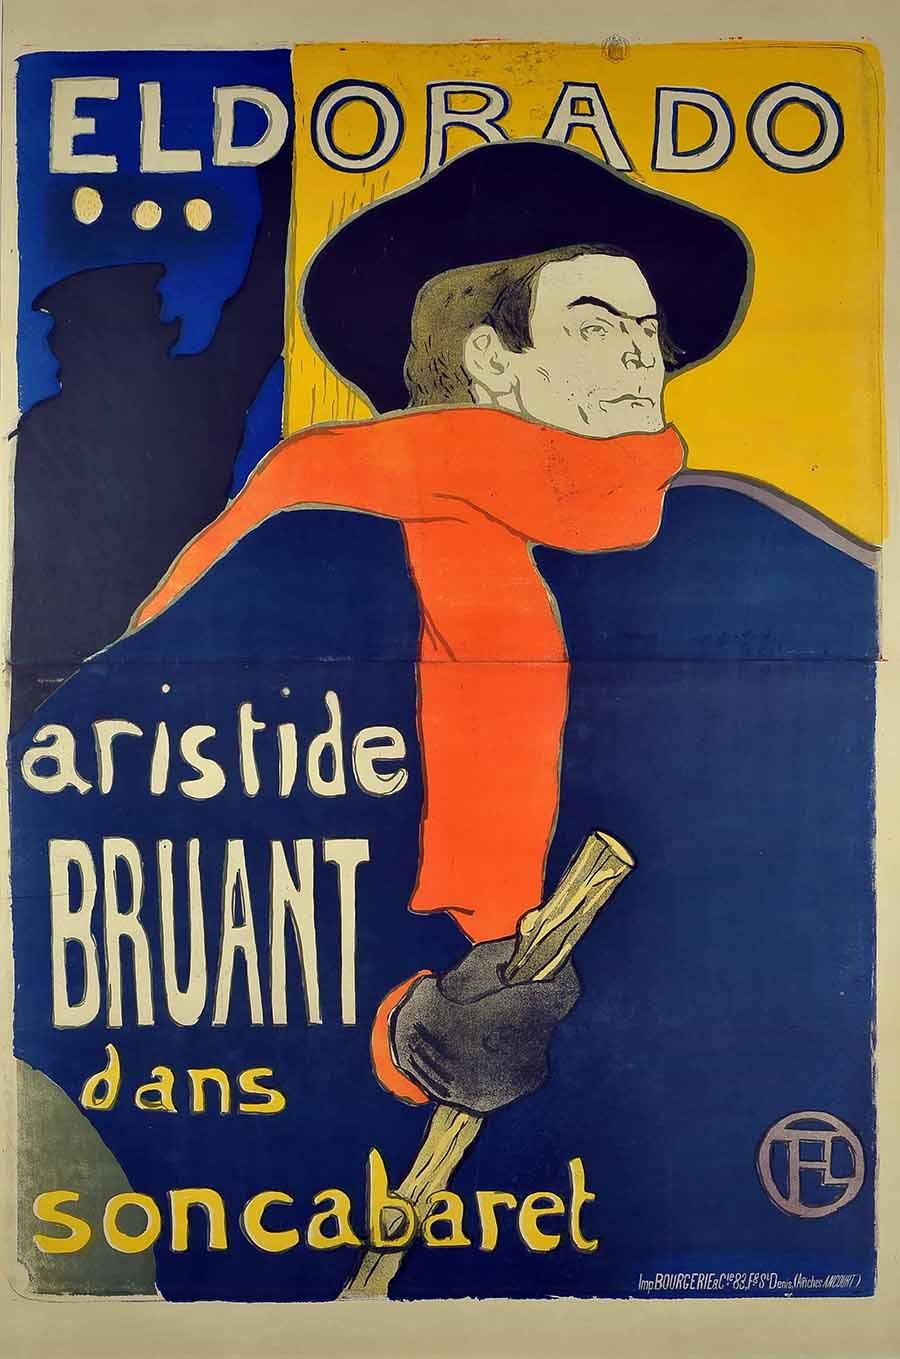 Eldorado... Aristide Bruant dans son